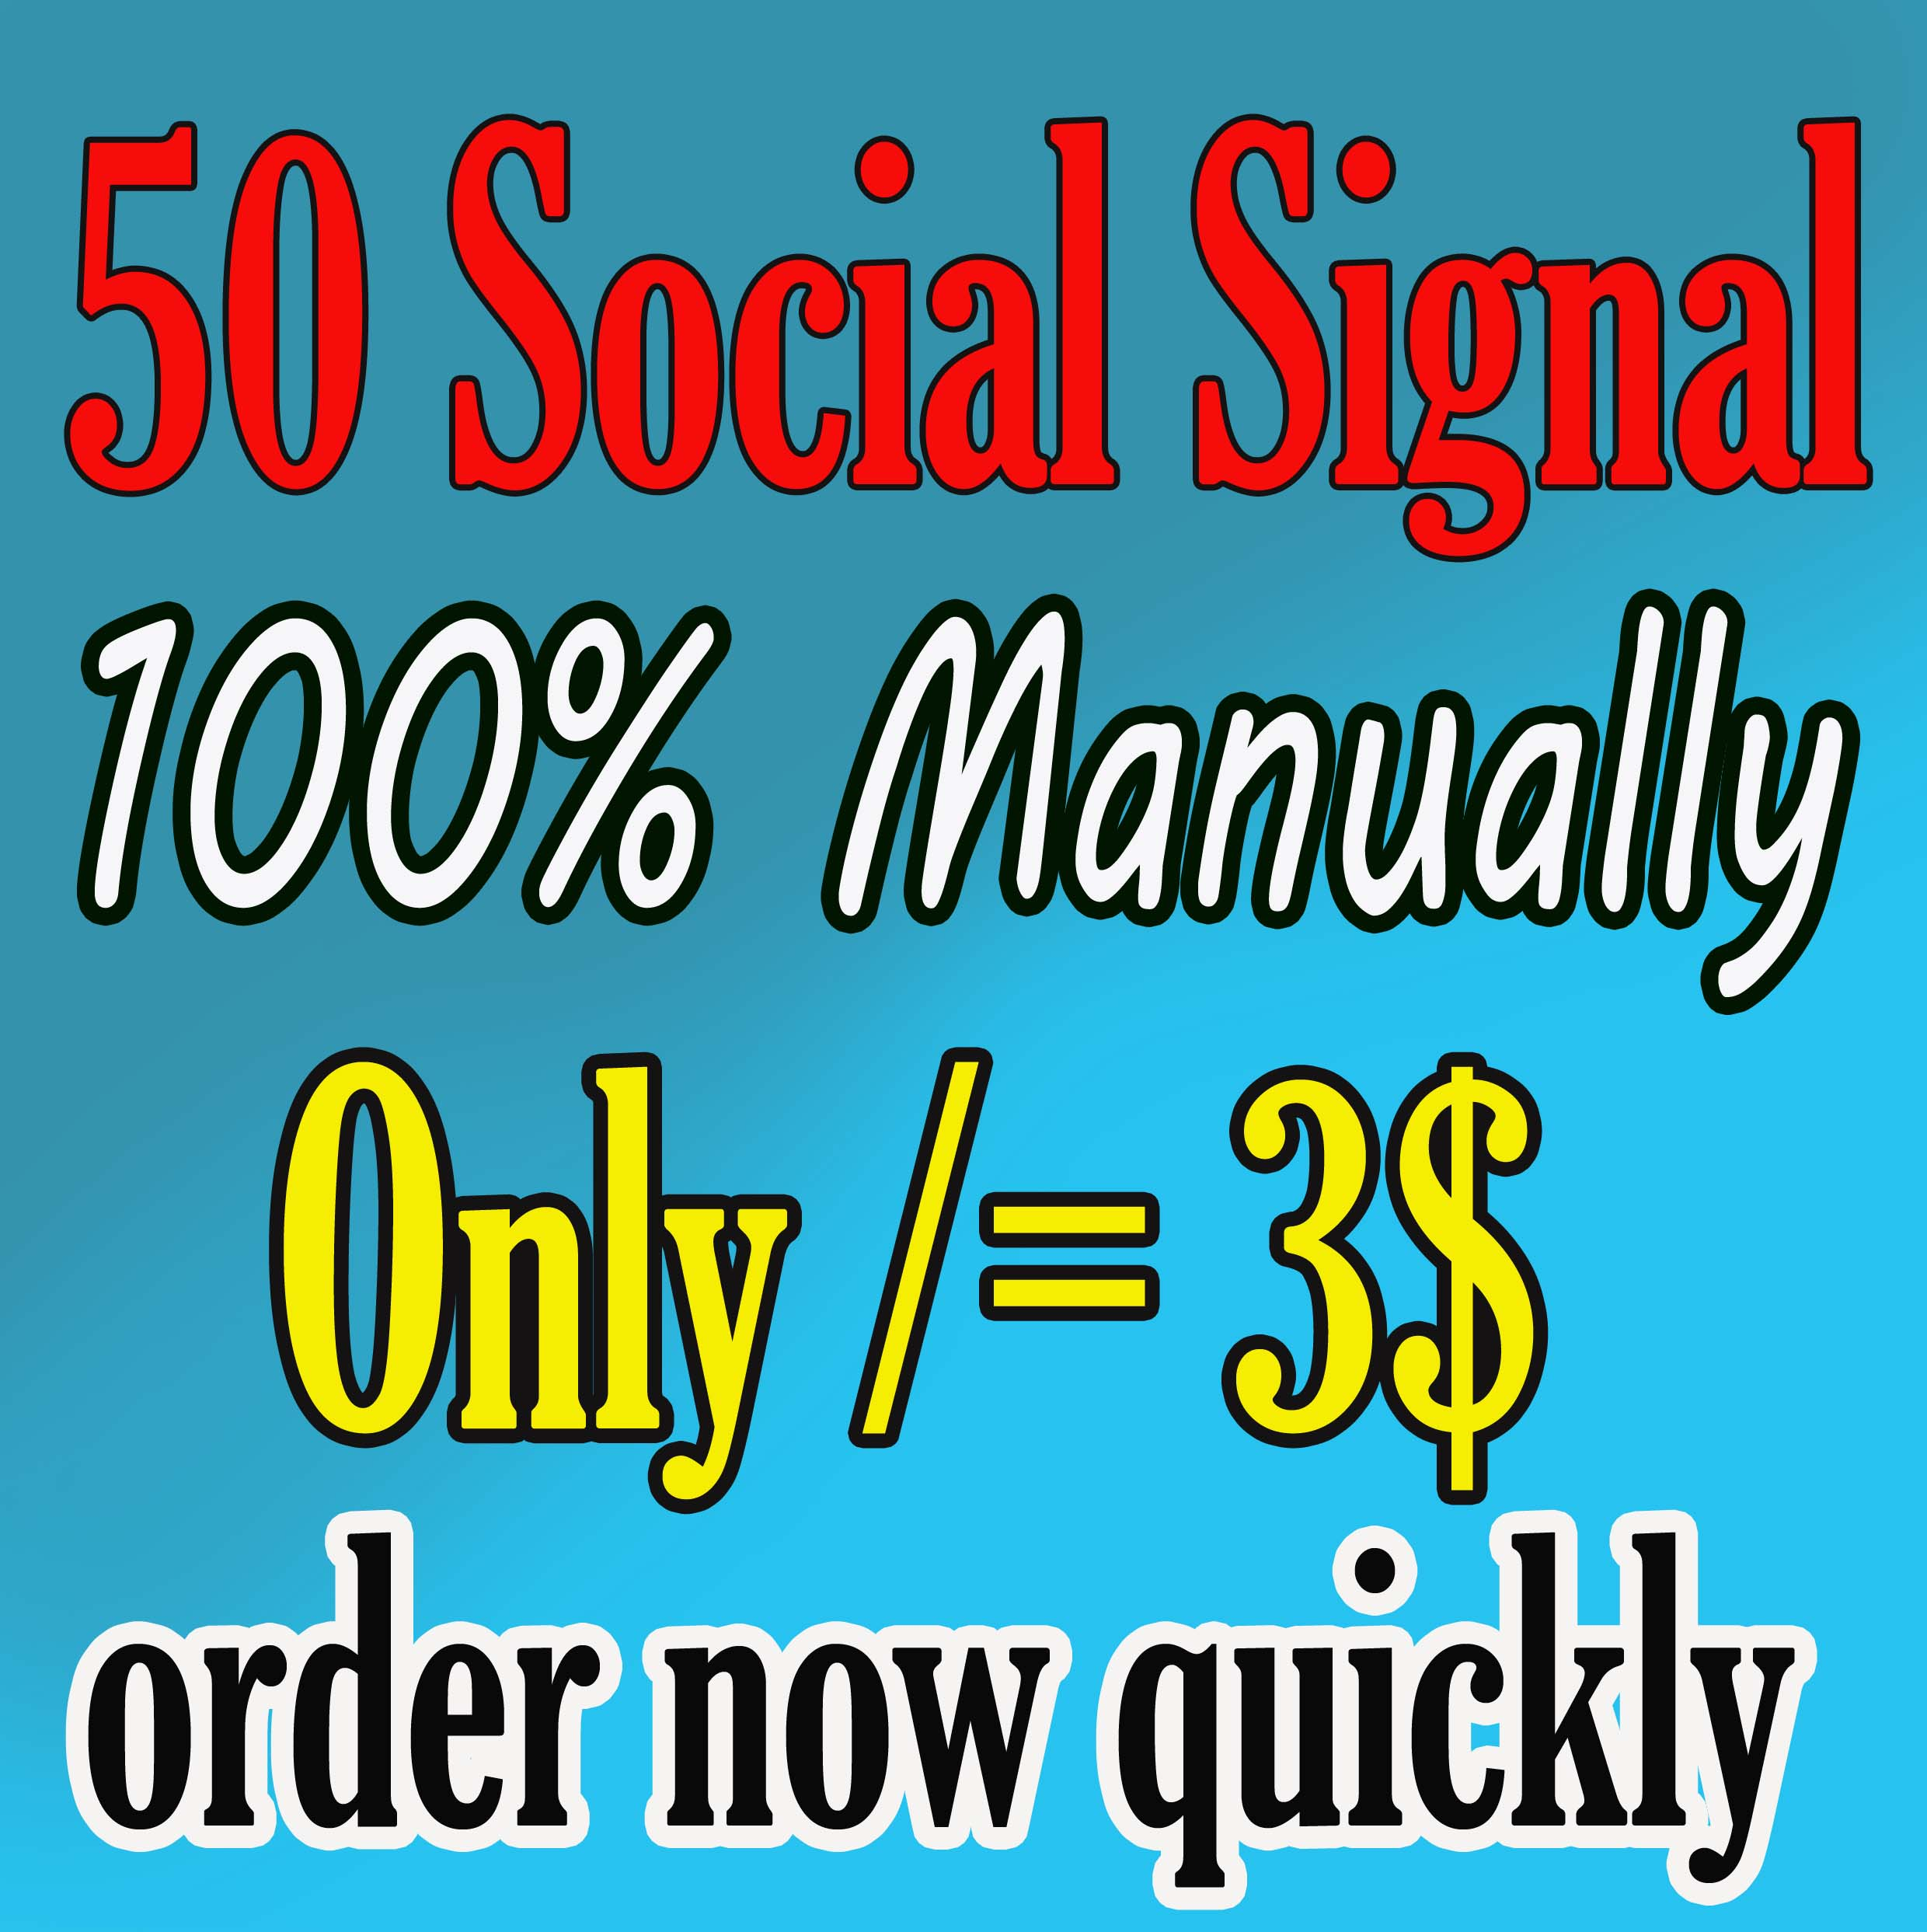 I will do 50 social signals on Facebook,  Twitter